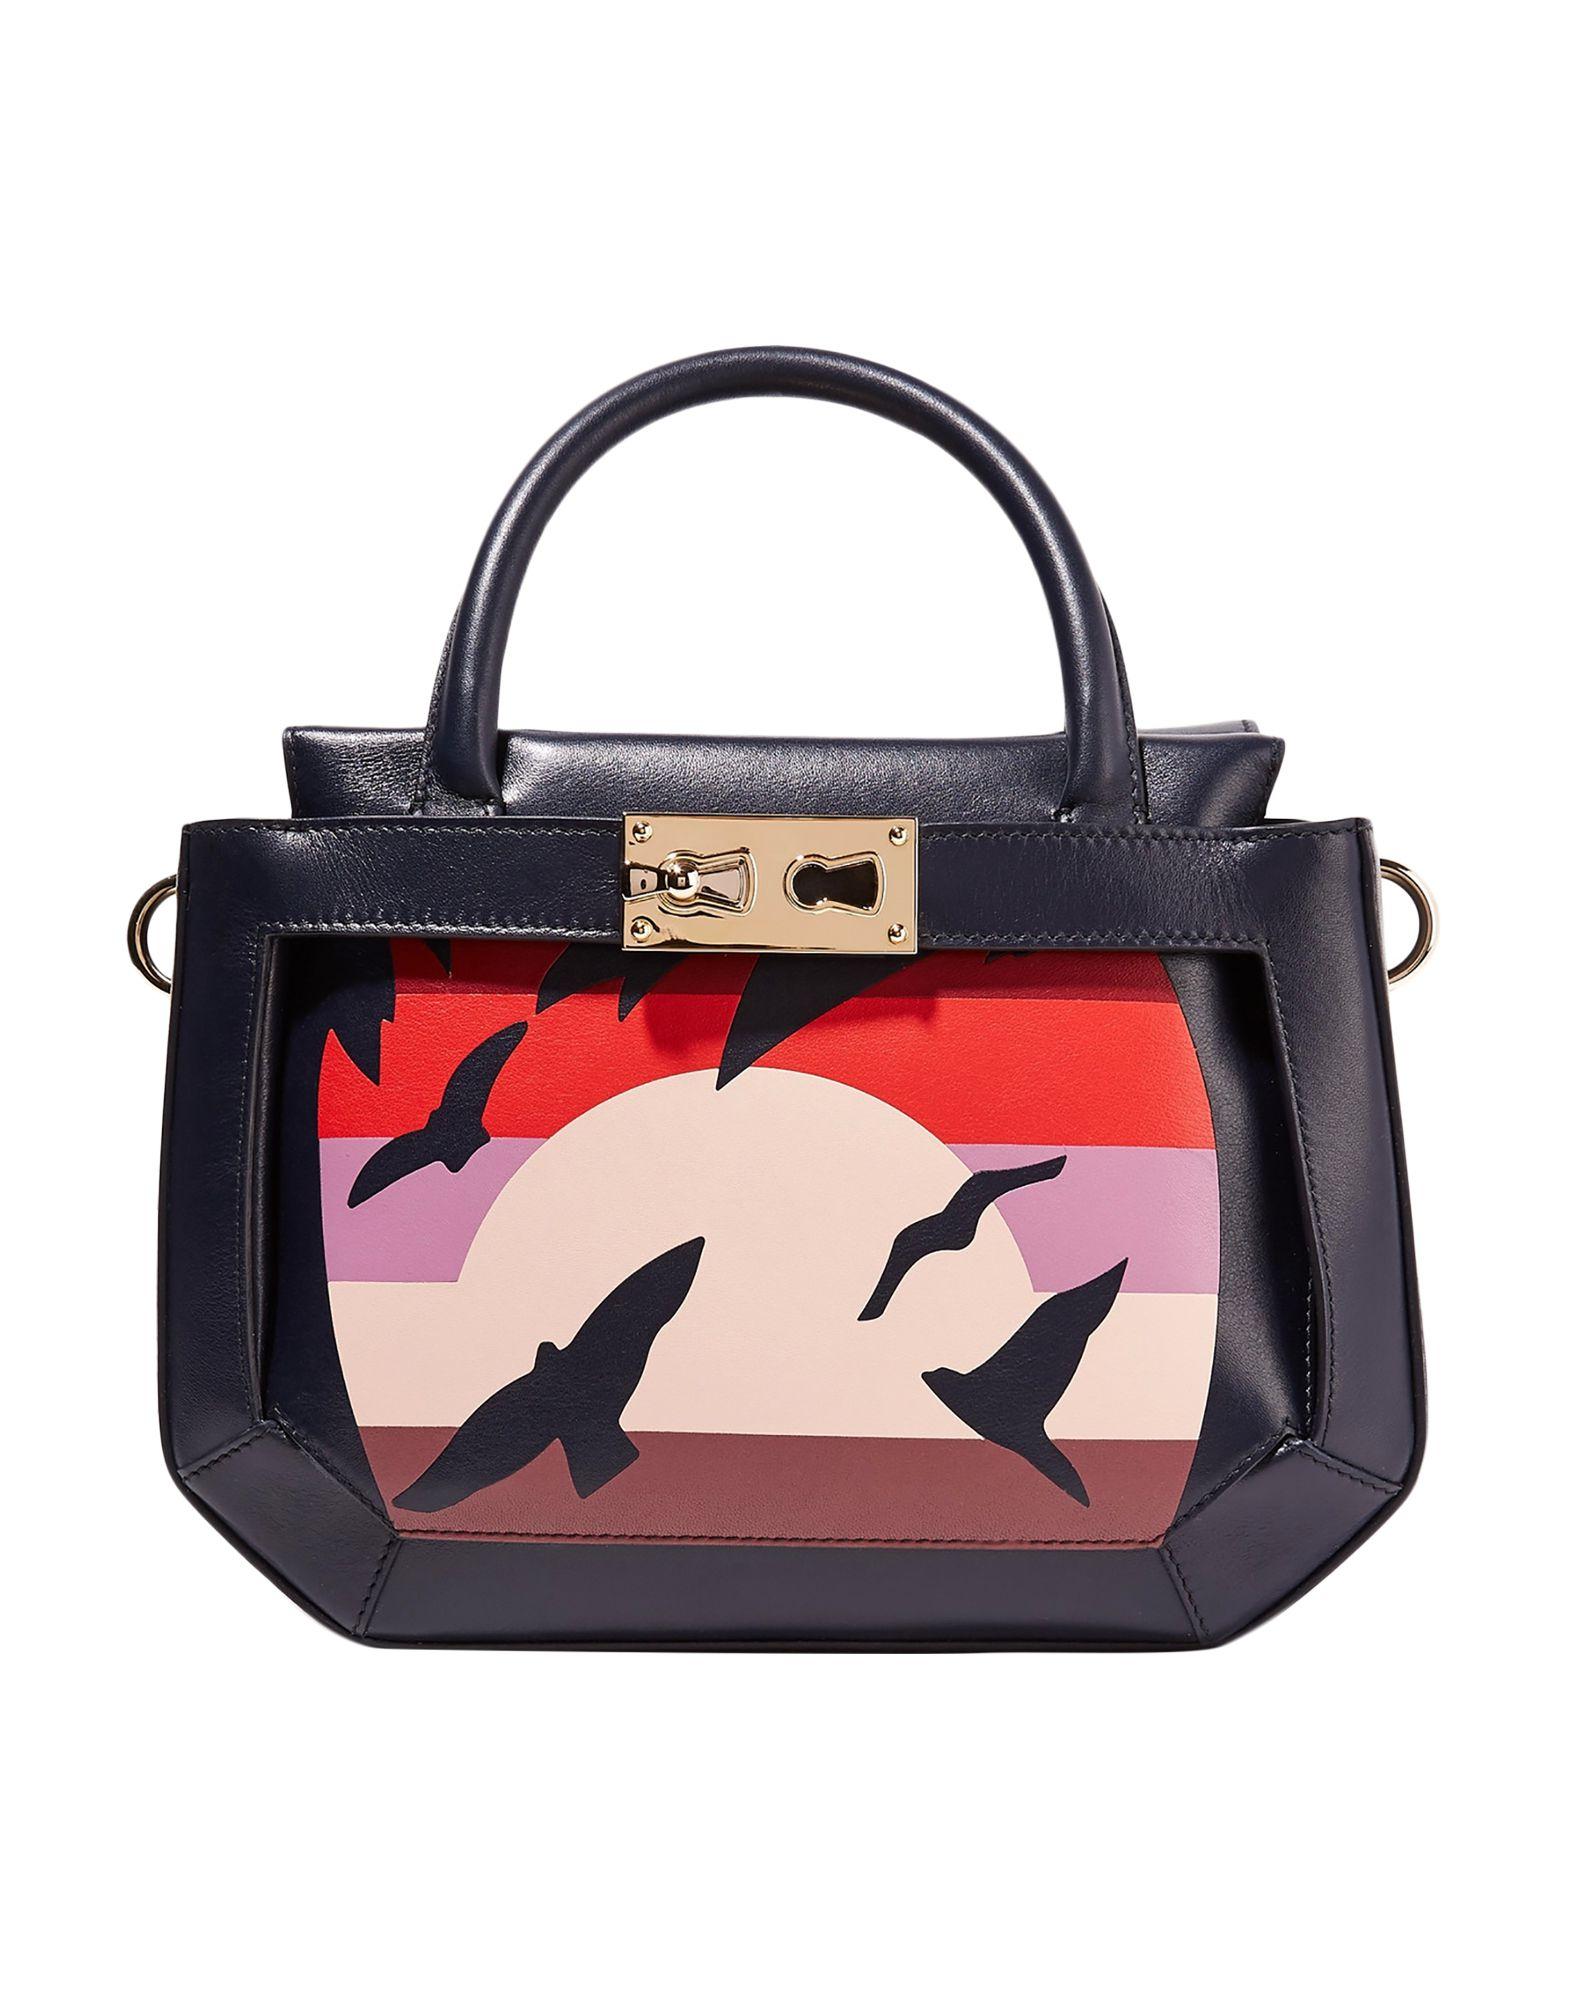 5dcedf9d05 Gianfranco Lotti Handbag - Women Gianfranco Lotti Handbags online on ...